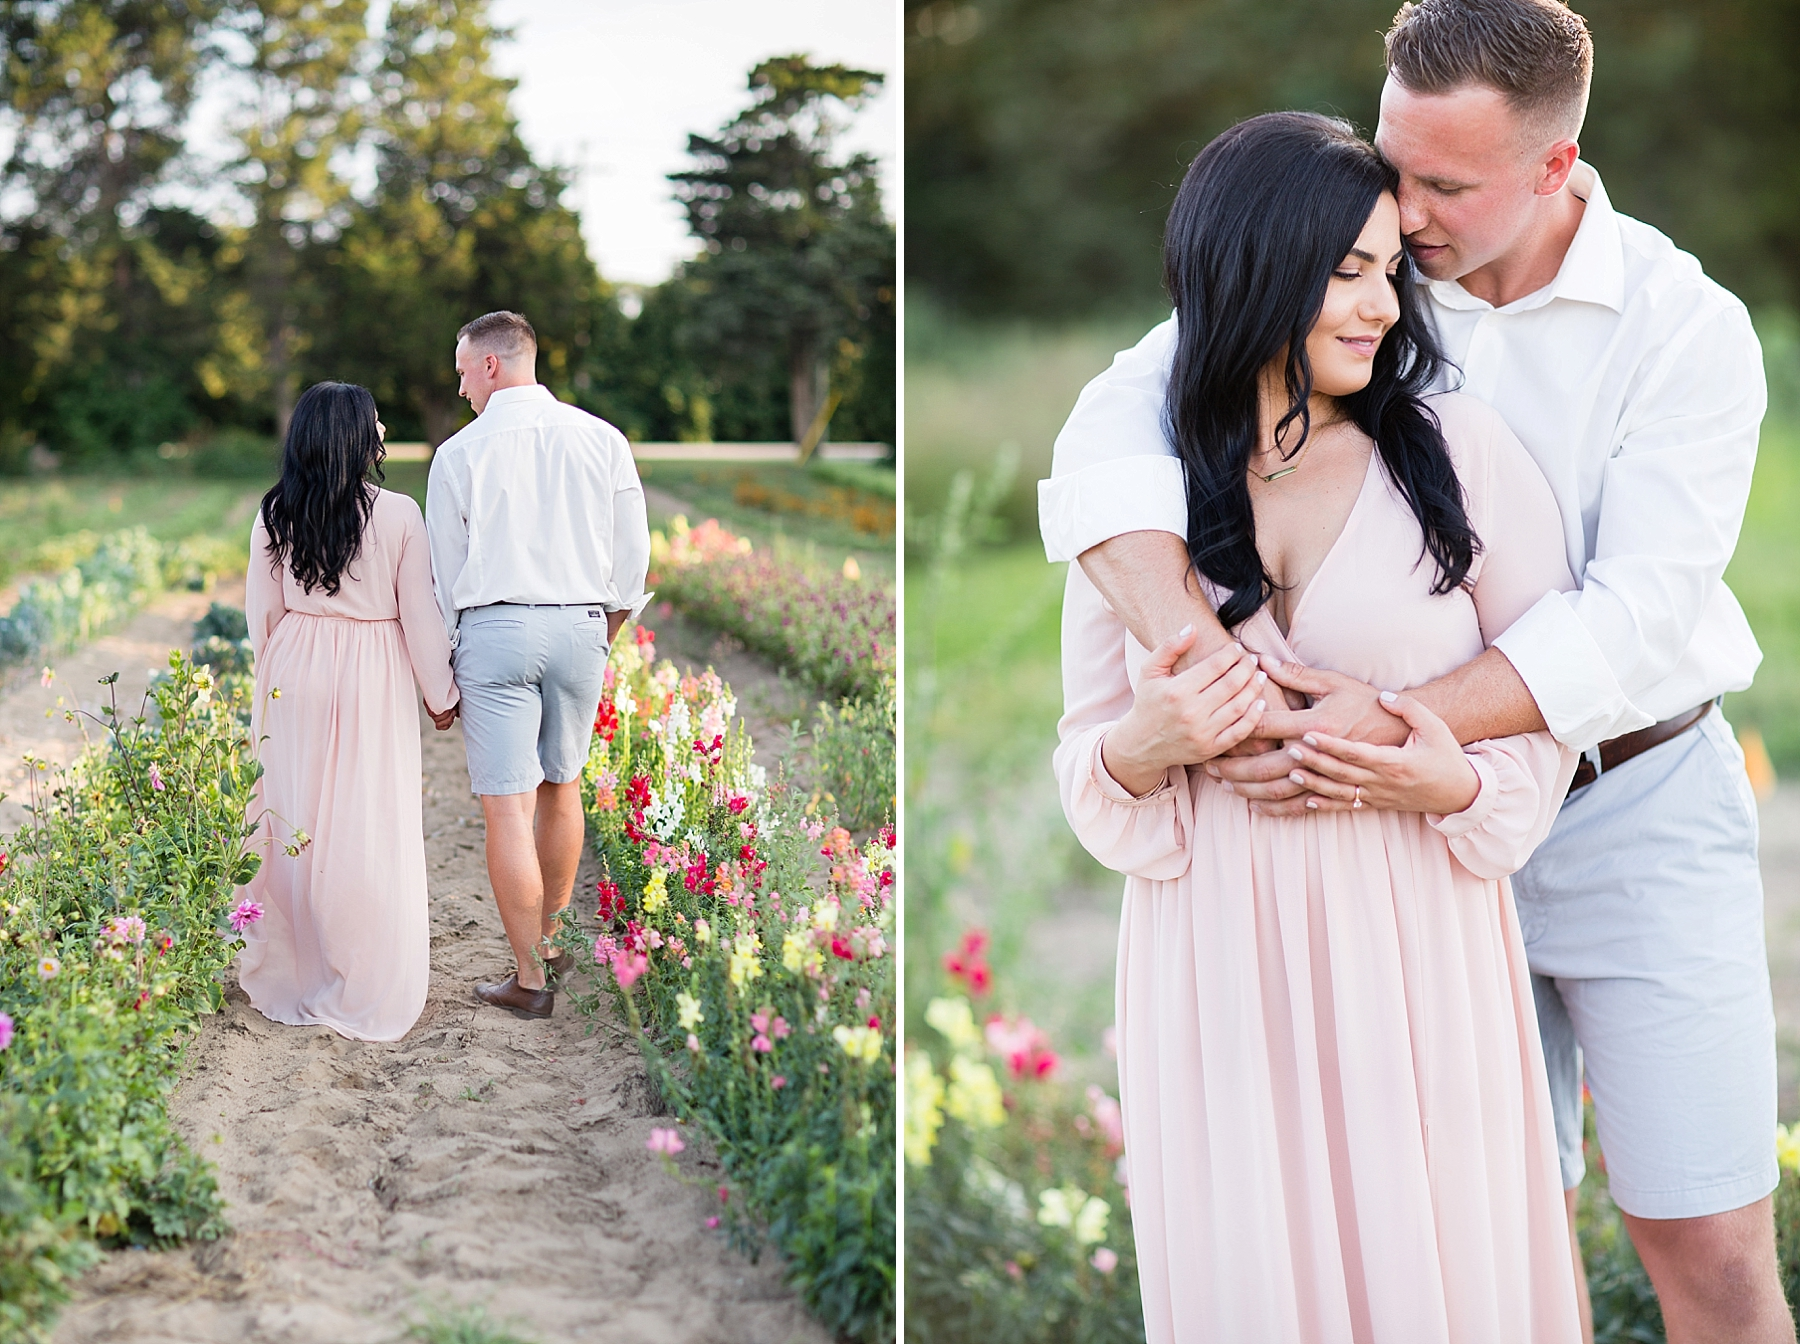 windsor-wedding-engagement-photographer-eryn-shea-photography-field-of-flowers_0010.jpg